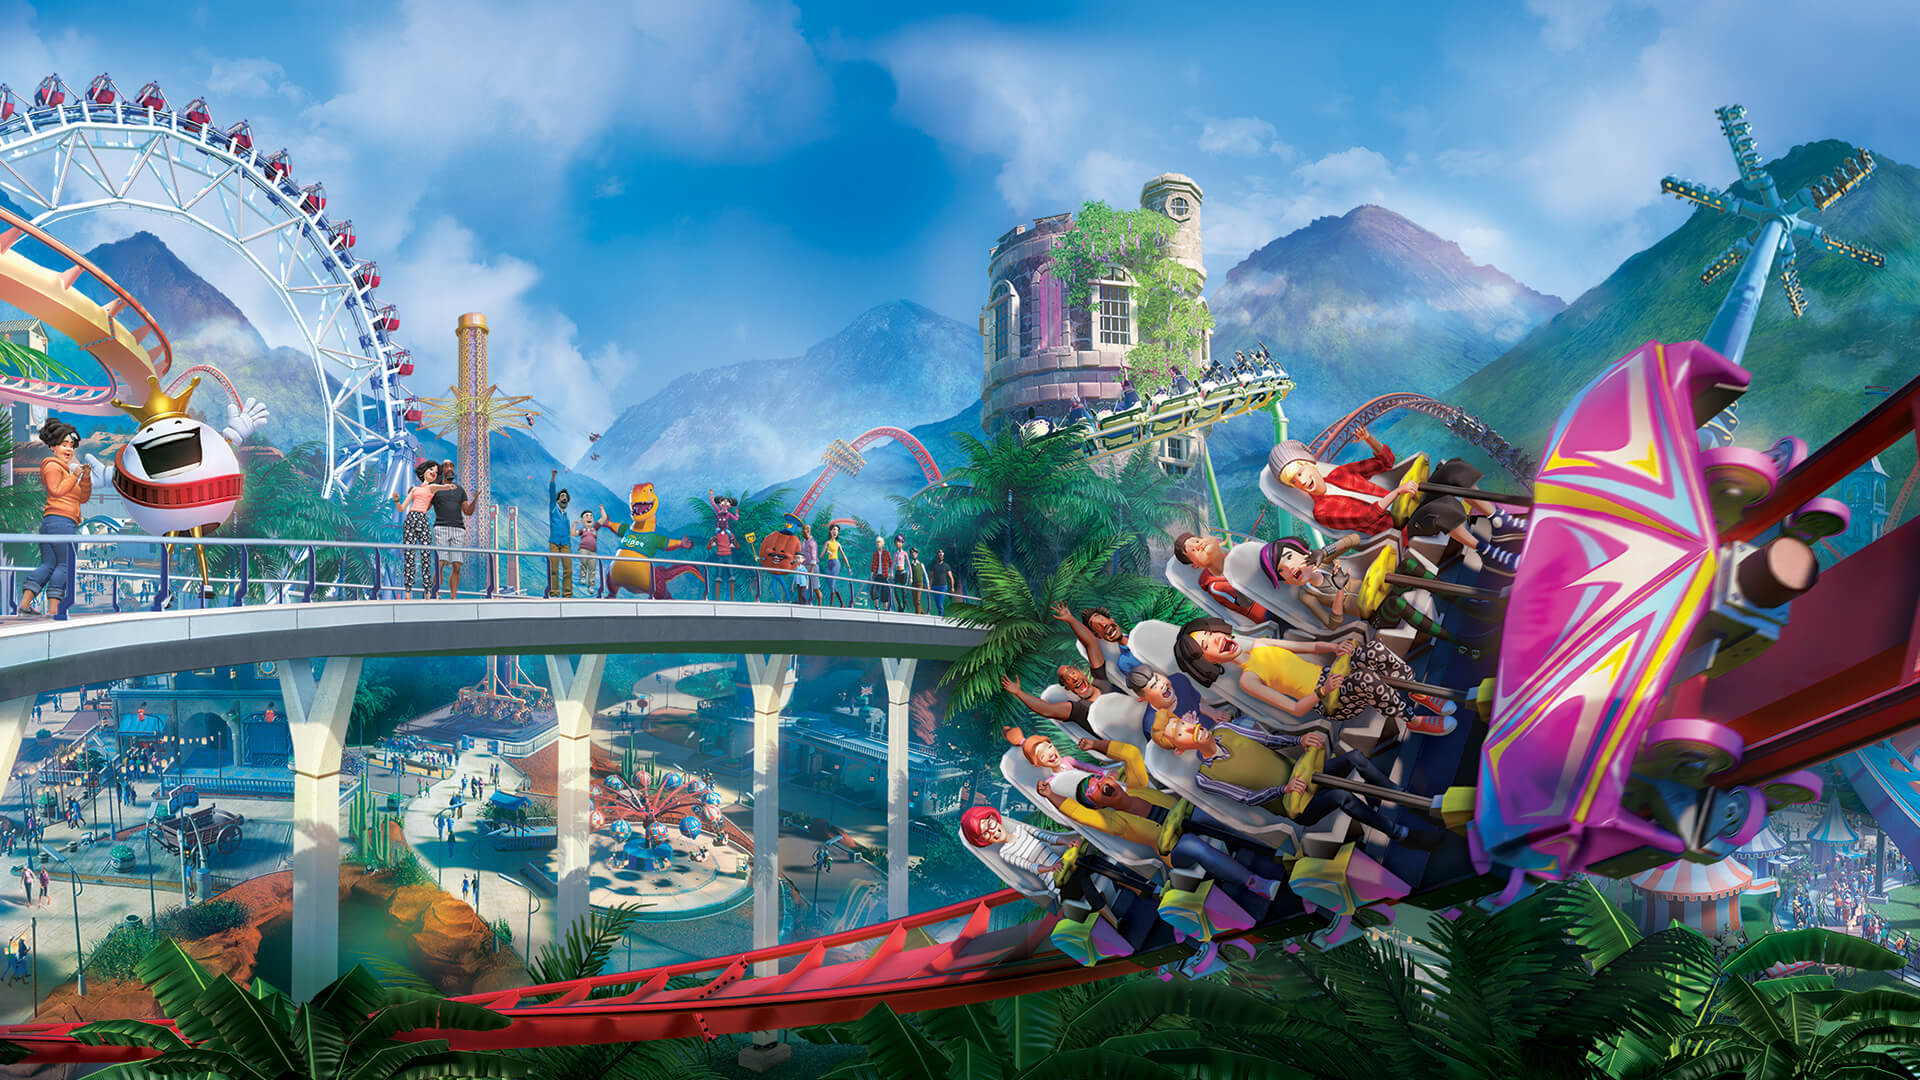 hd planet coaster wallpaper 72240